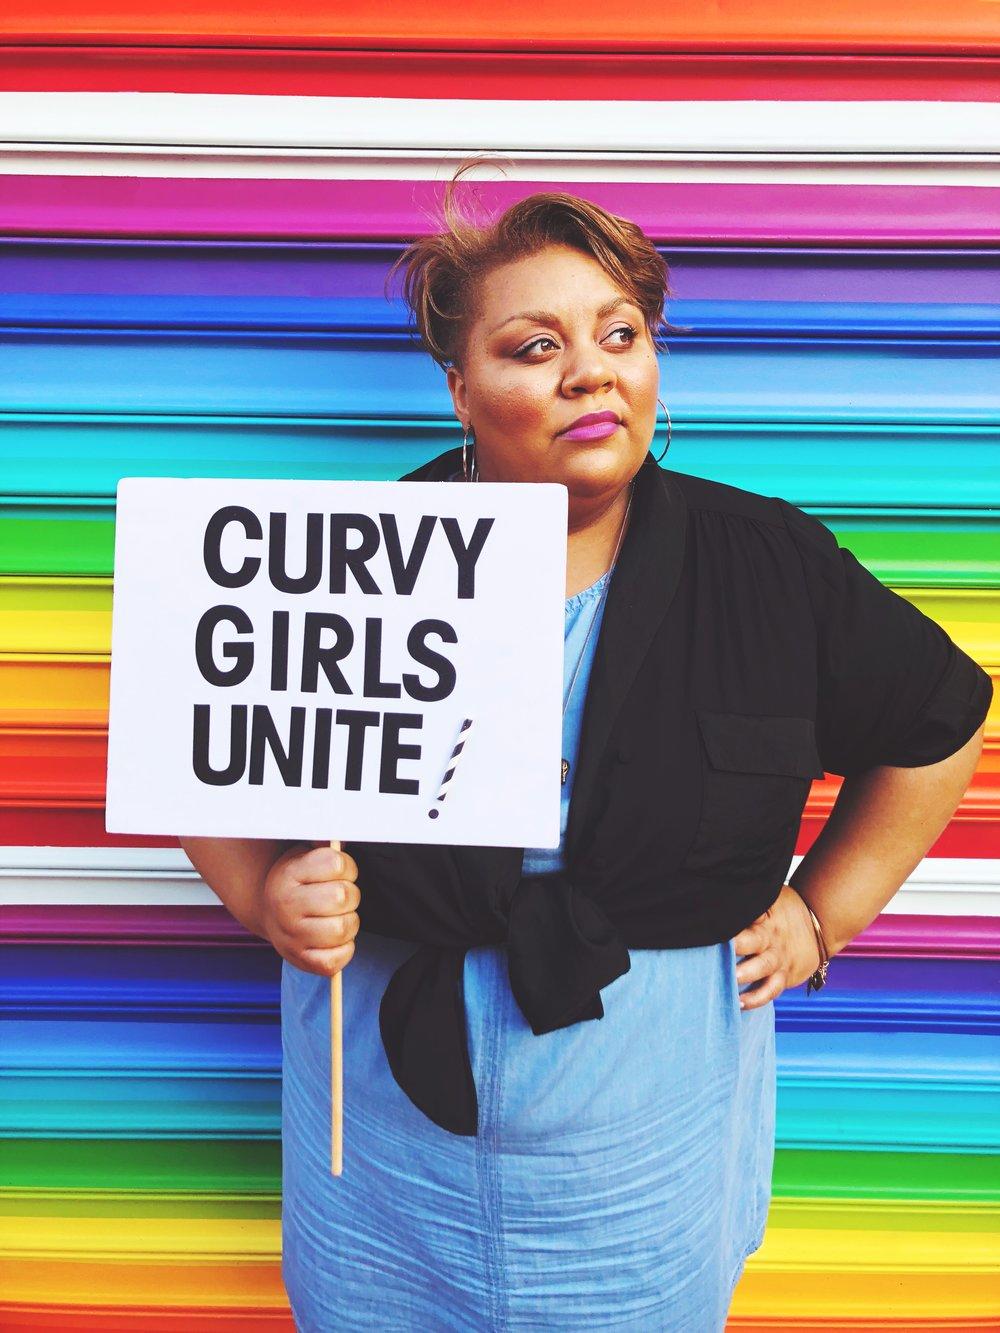 Curvy Girls Unite